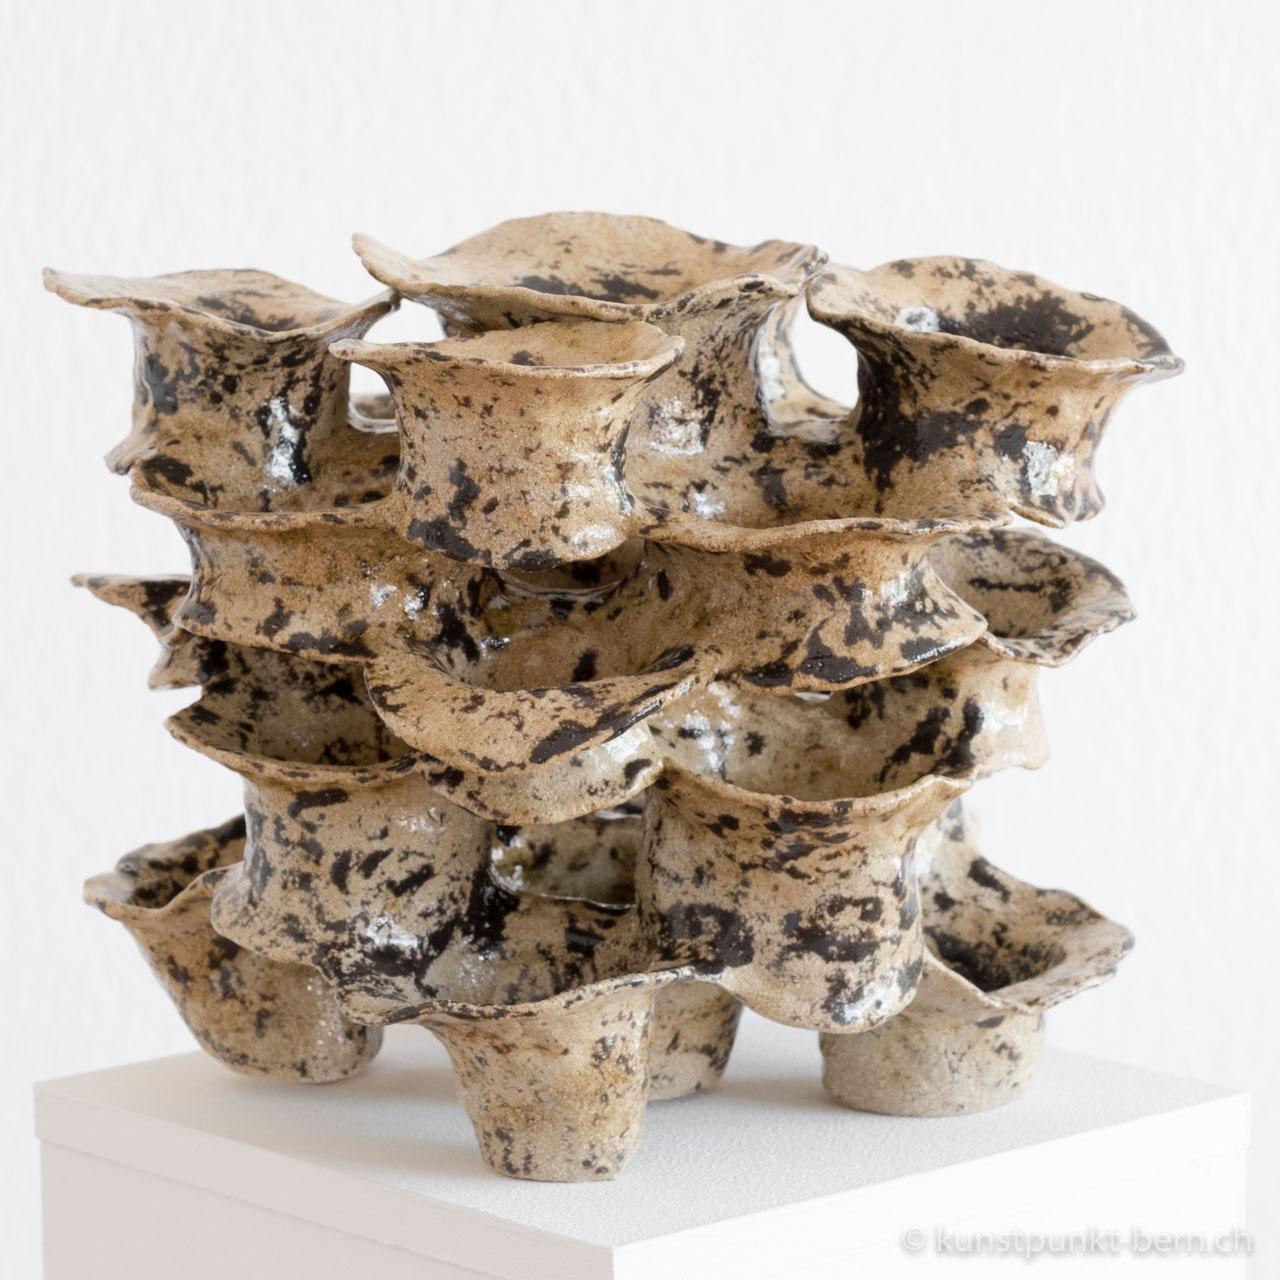 Porifera - Tonskulptur von Judith Kaffka kunstpunkt-bern.ch